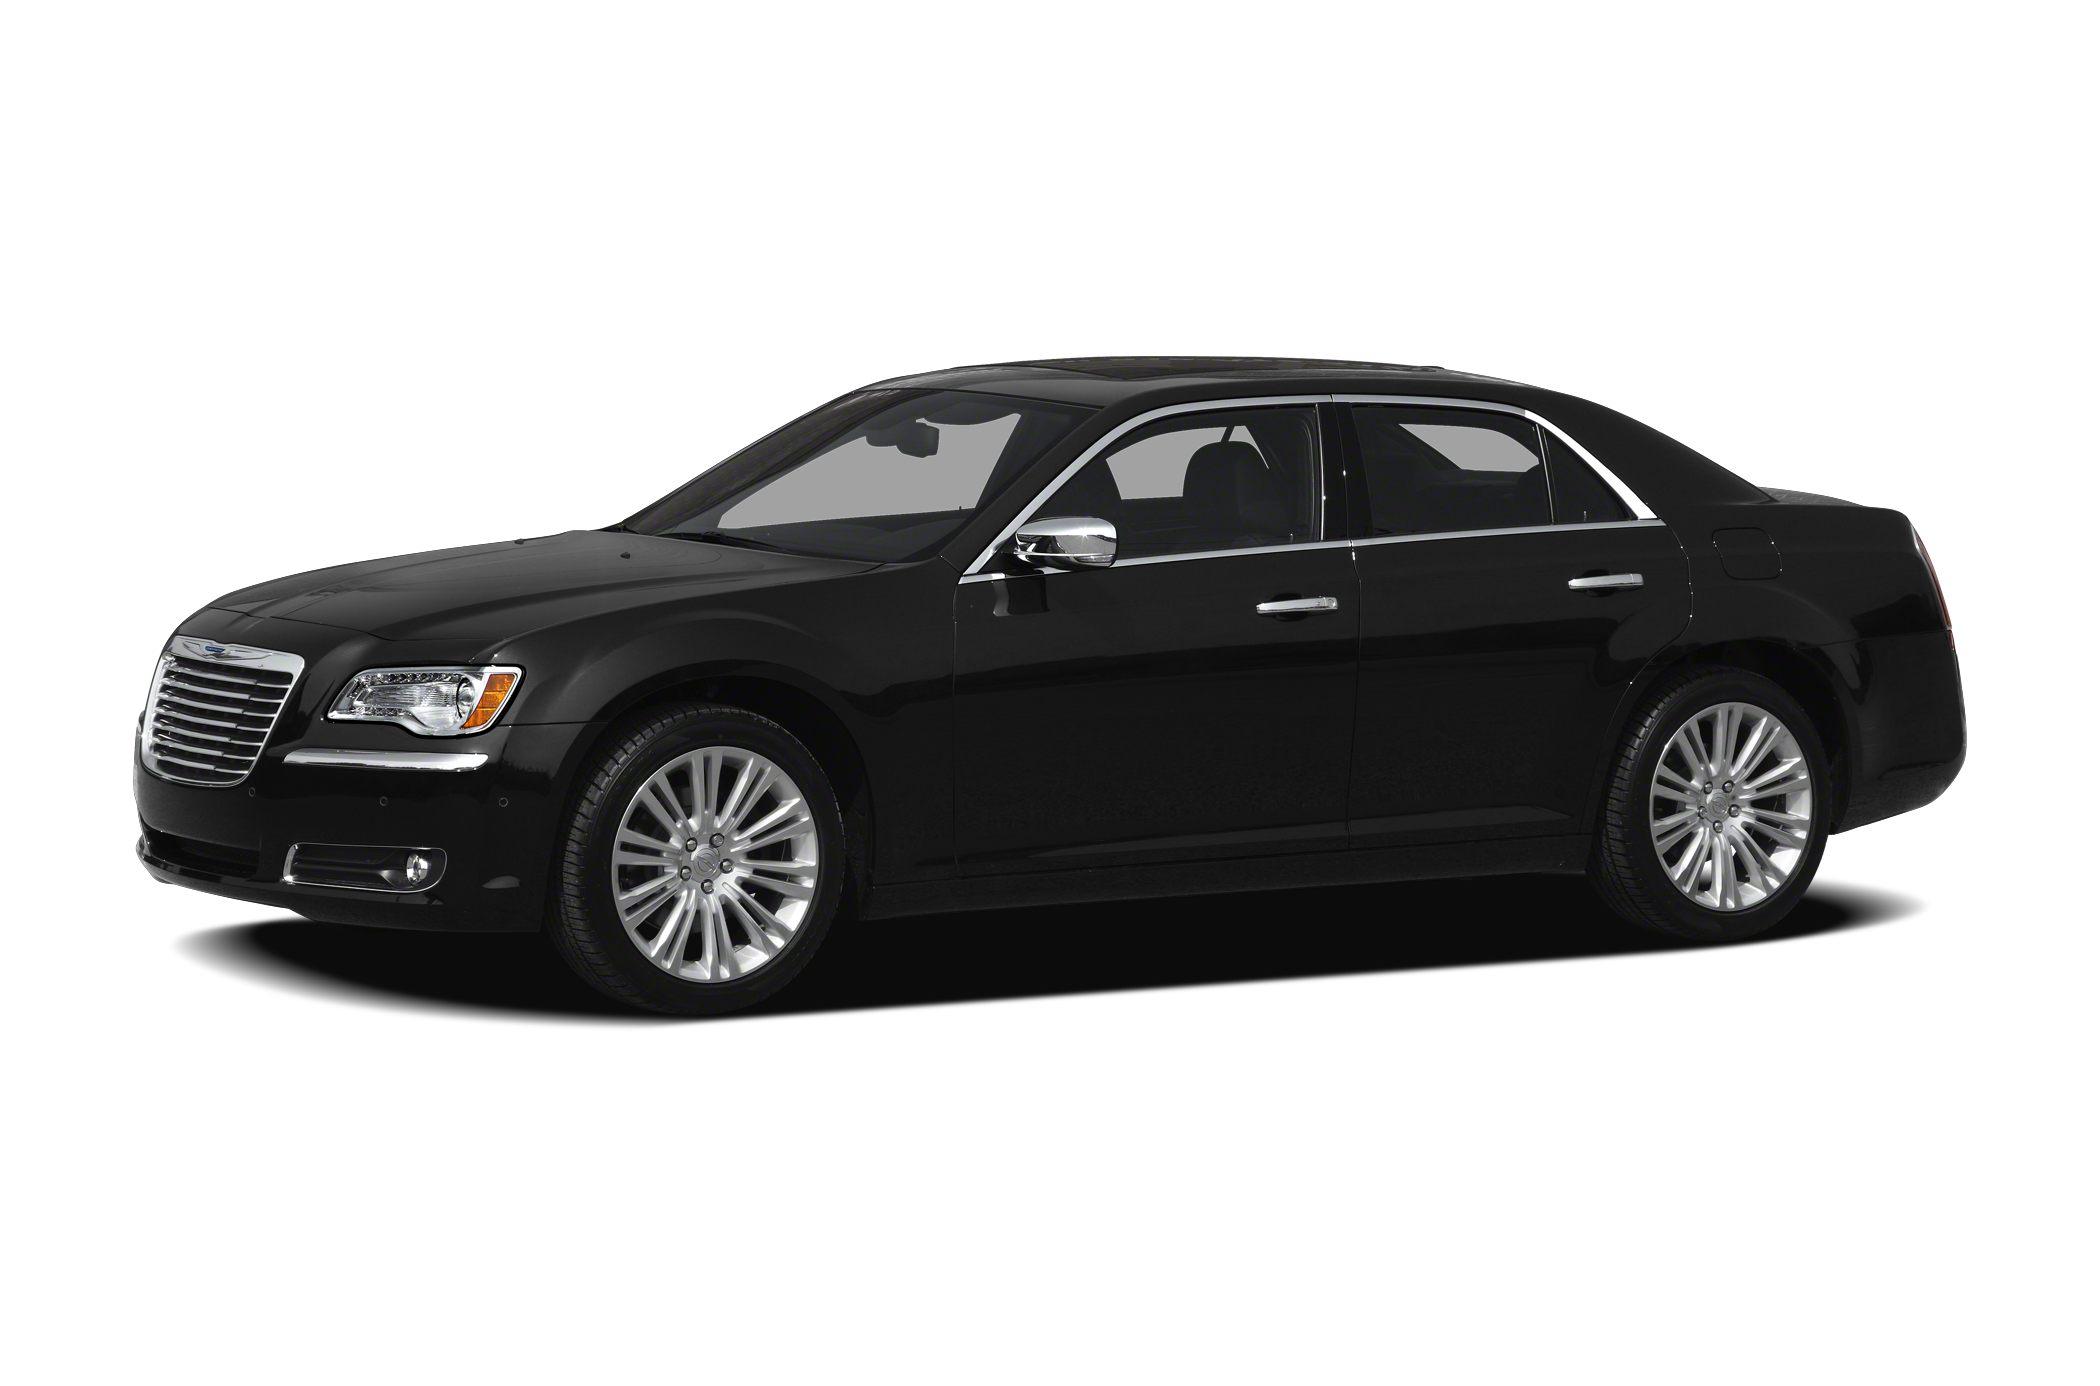 2011 Chrysler 300C Base Sedan for sale in Lake Charles for $0 with 38,308 miles